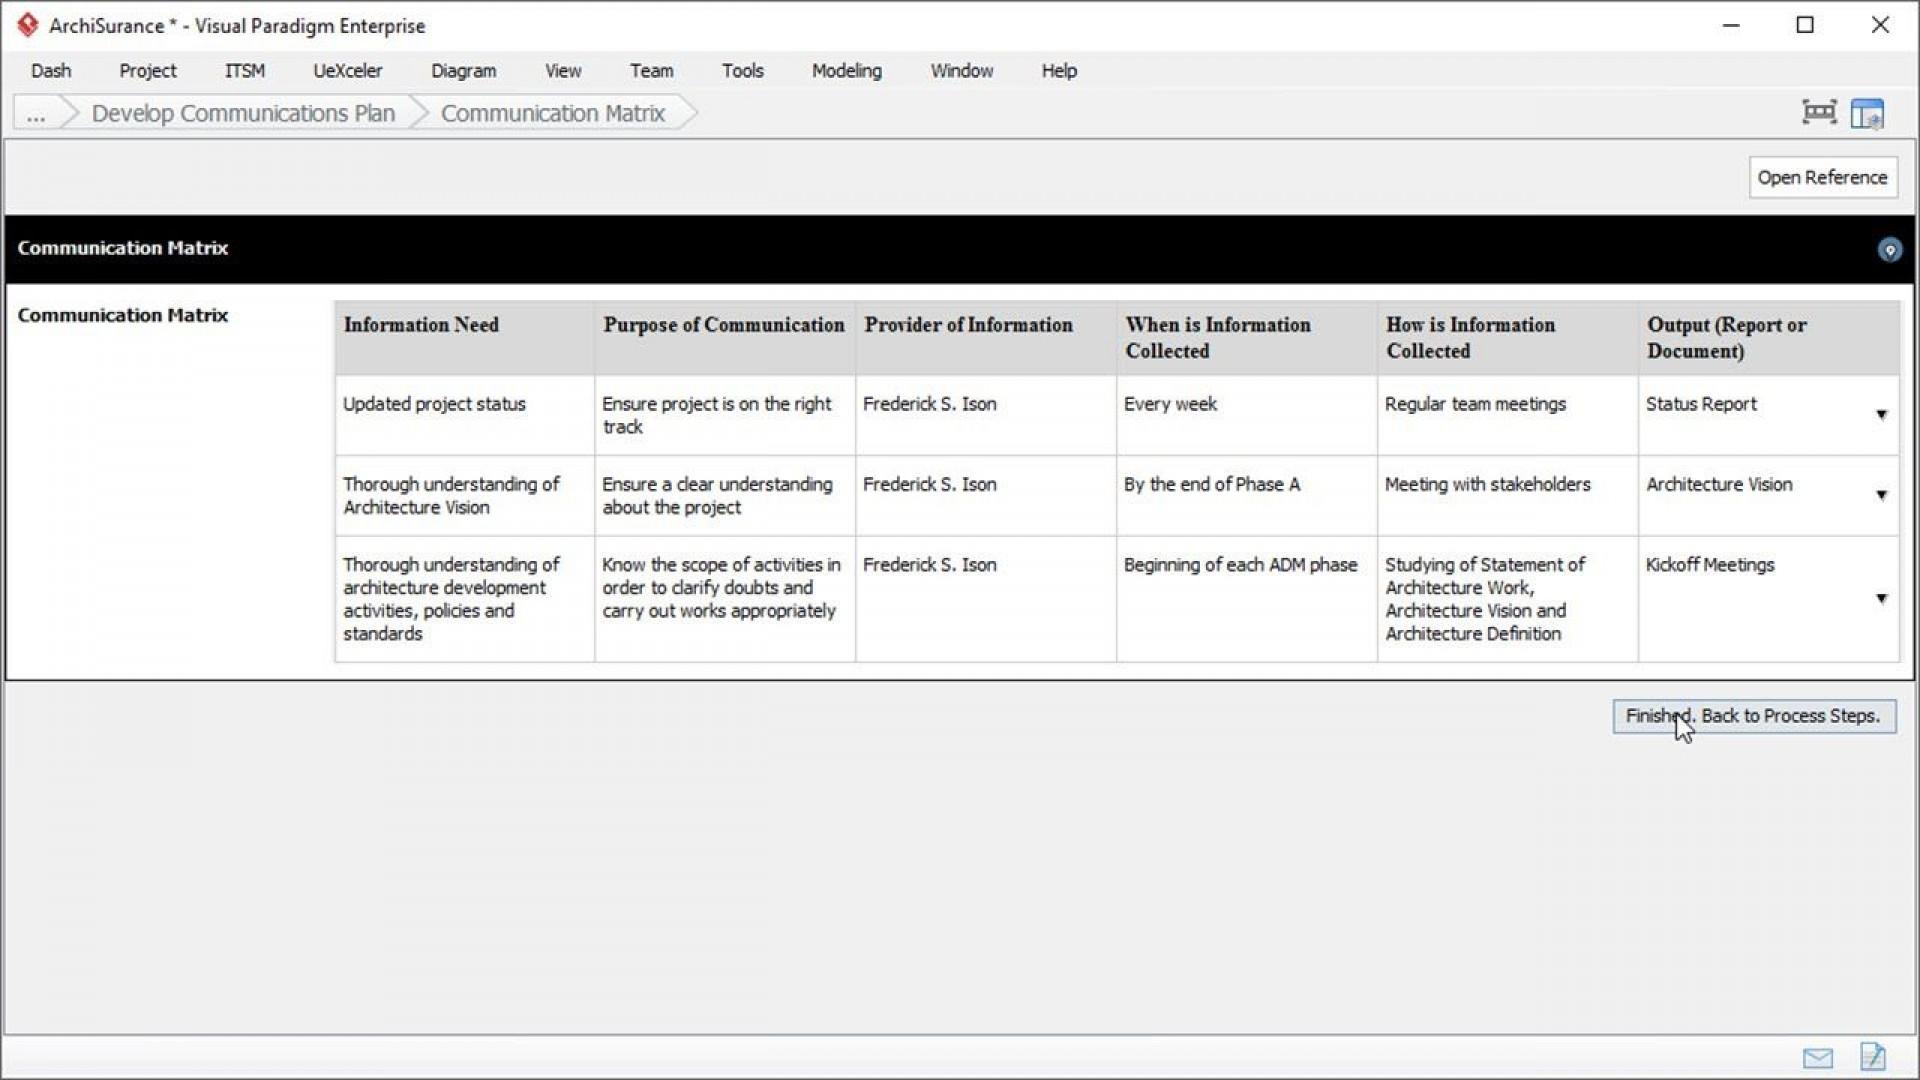 007 Wonderful Project Communication Plan Template Image  Pmbok Pdf Excel Free1920